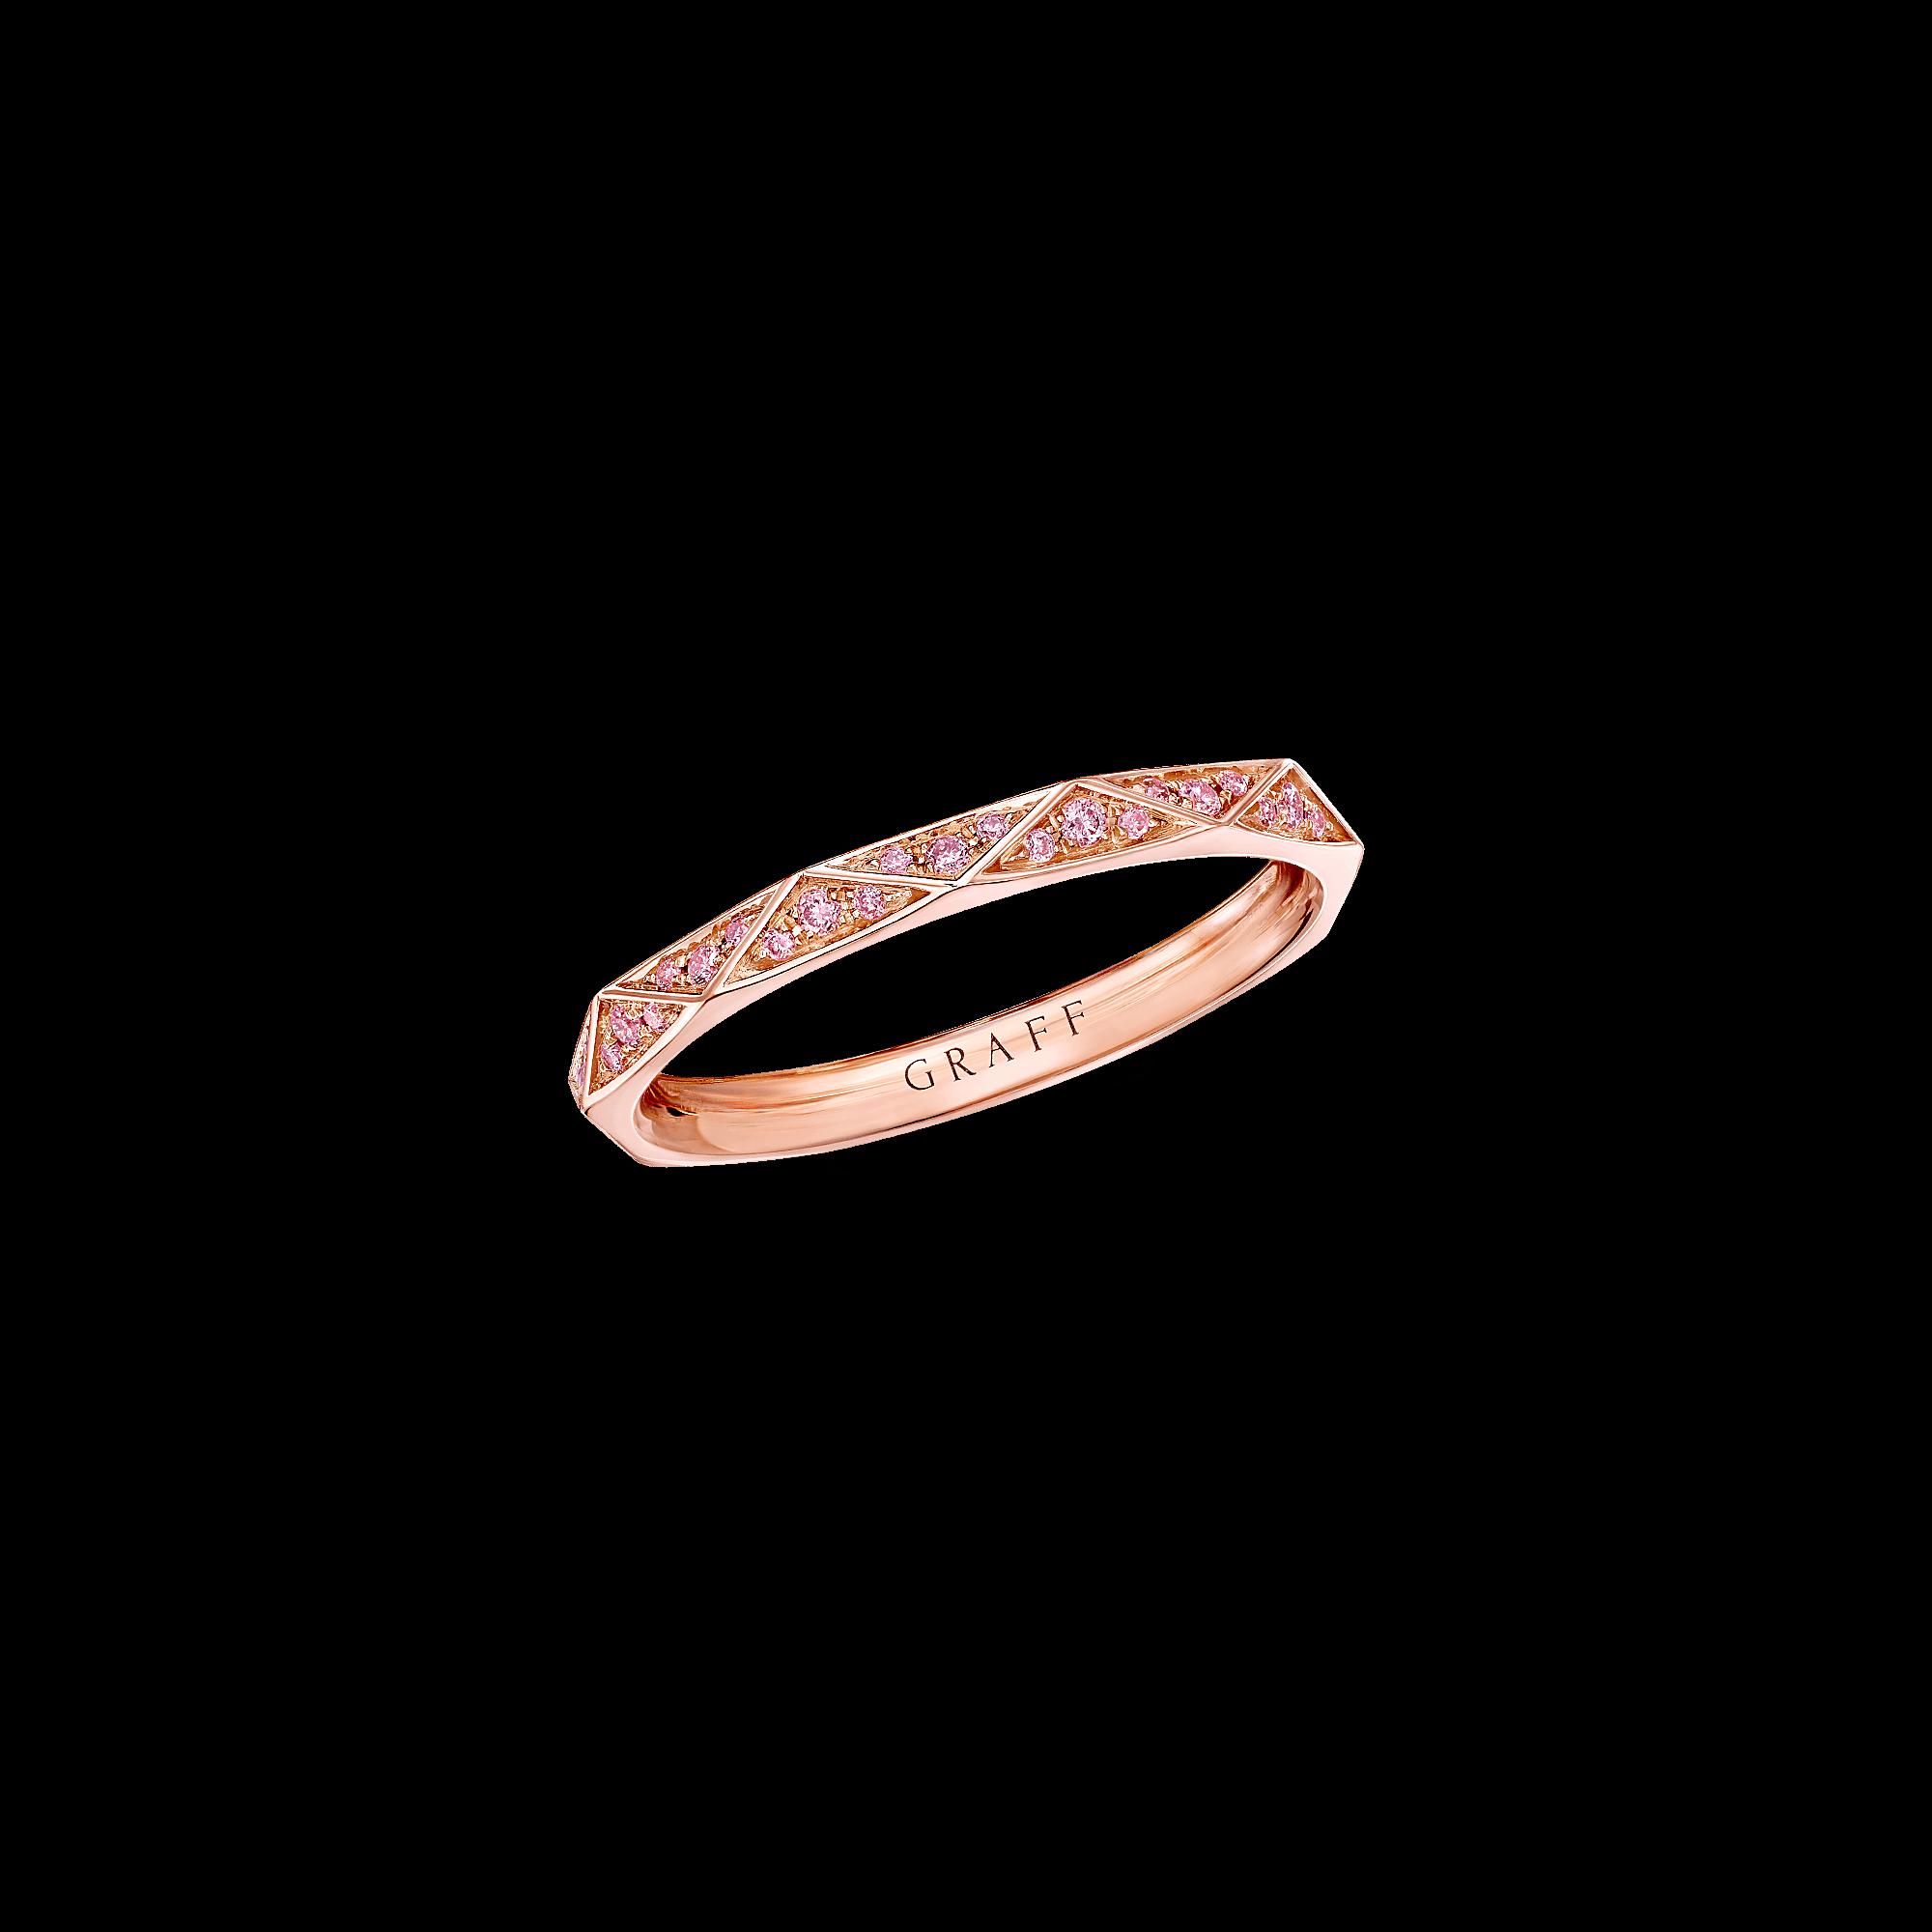 Laurence Graff Signature Pink Diamond Ring Rose Gold 2 3mm Graff Pink Diamond Ring Pink Diamond Ring Rose Gold Graff Pink Diamond Ring